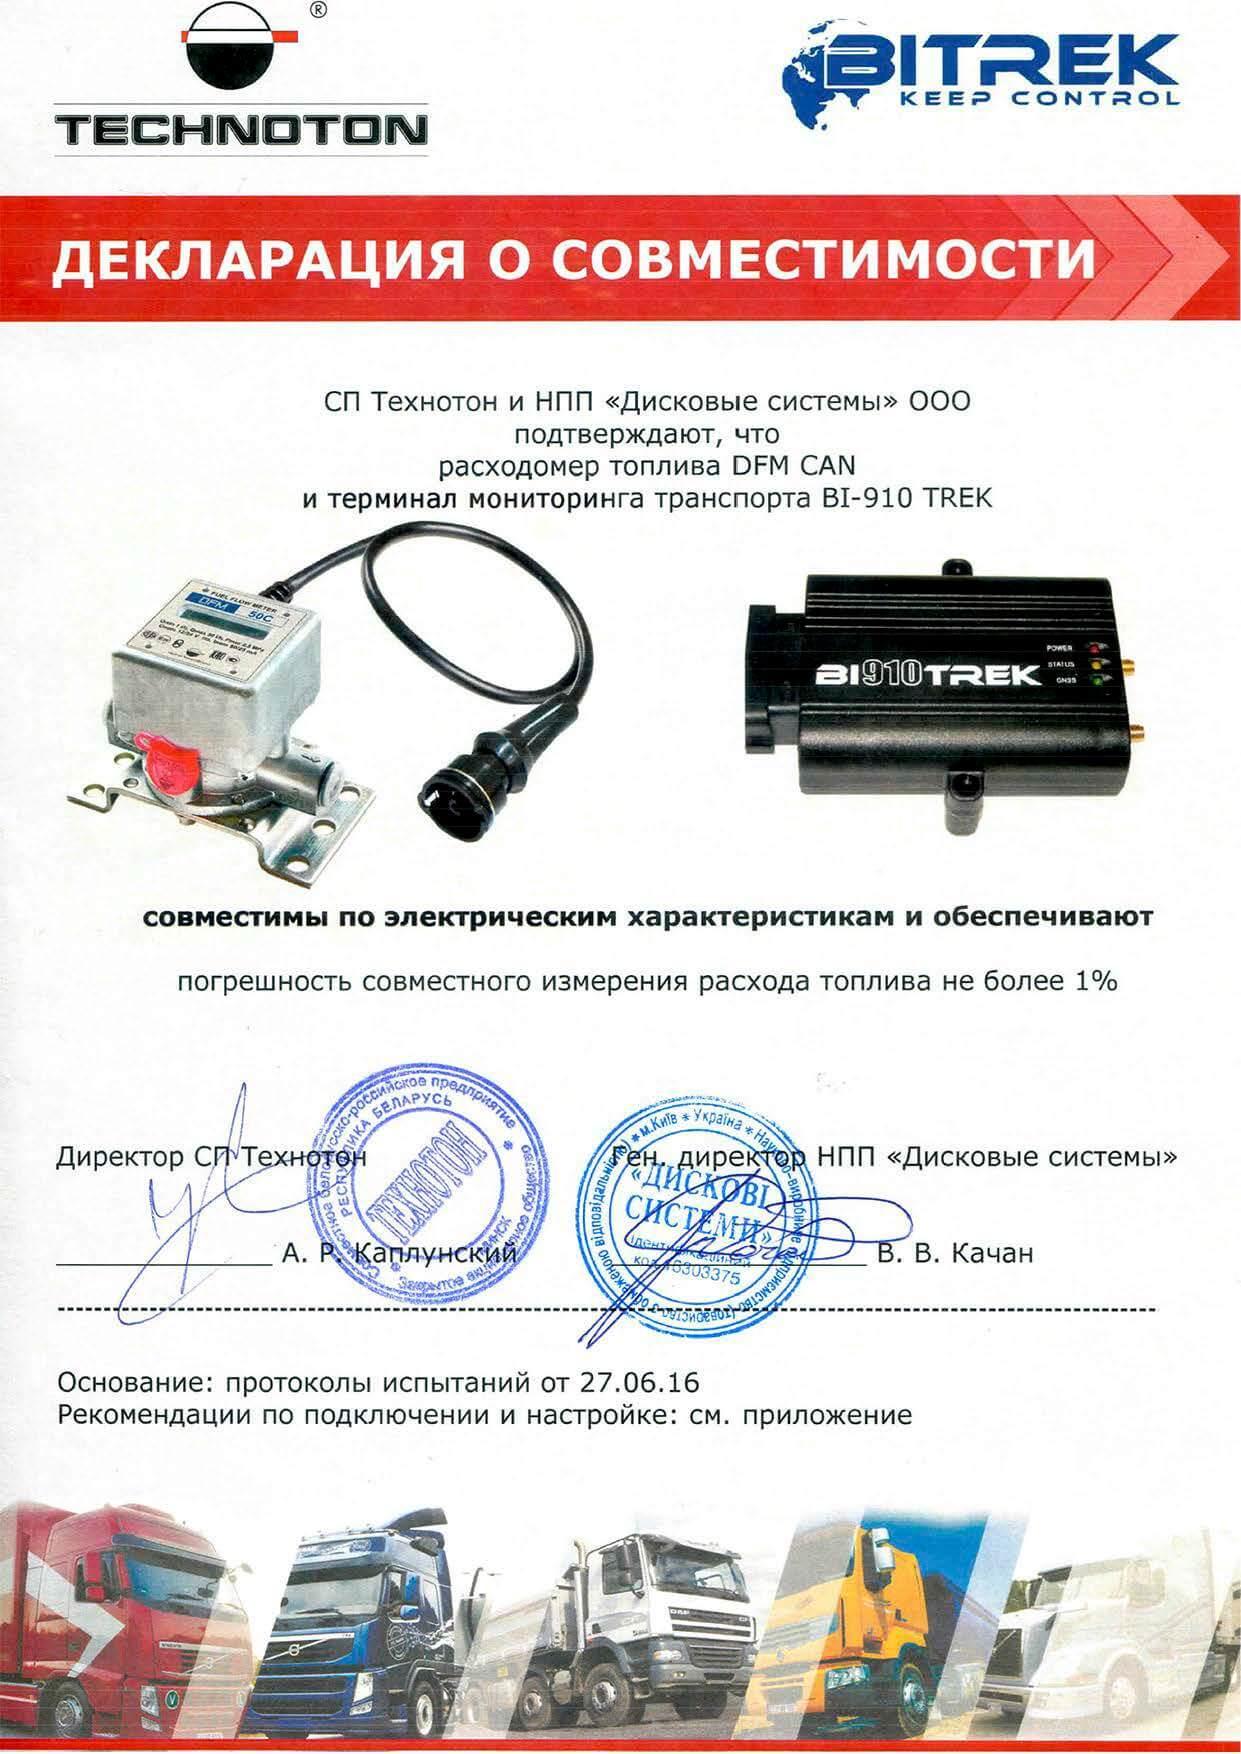 DFM CAN совместим с BITREK BI 910 TREK